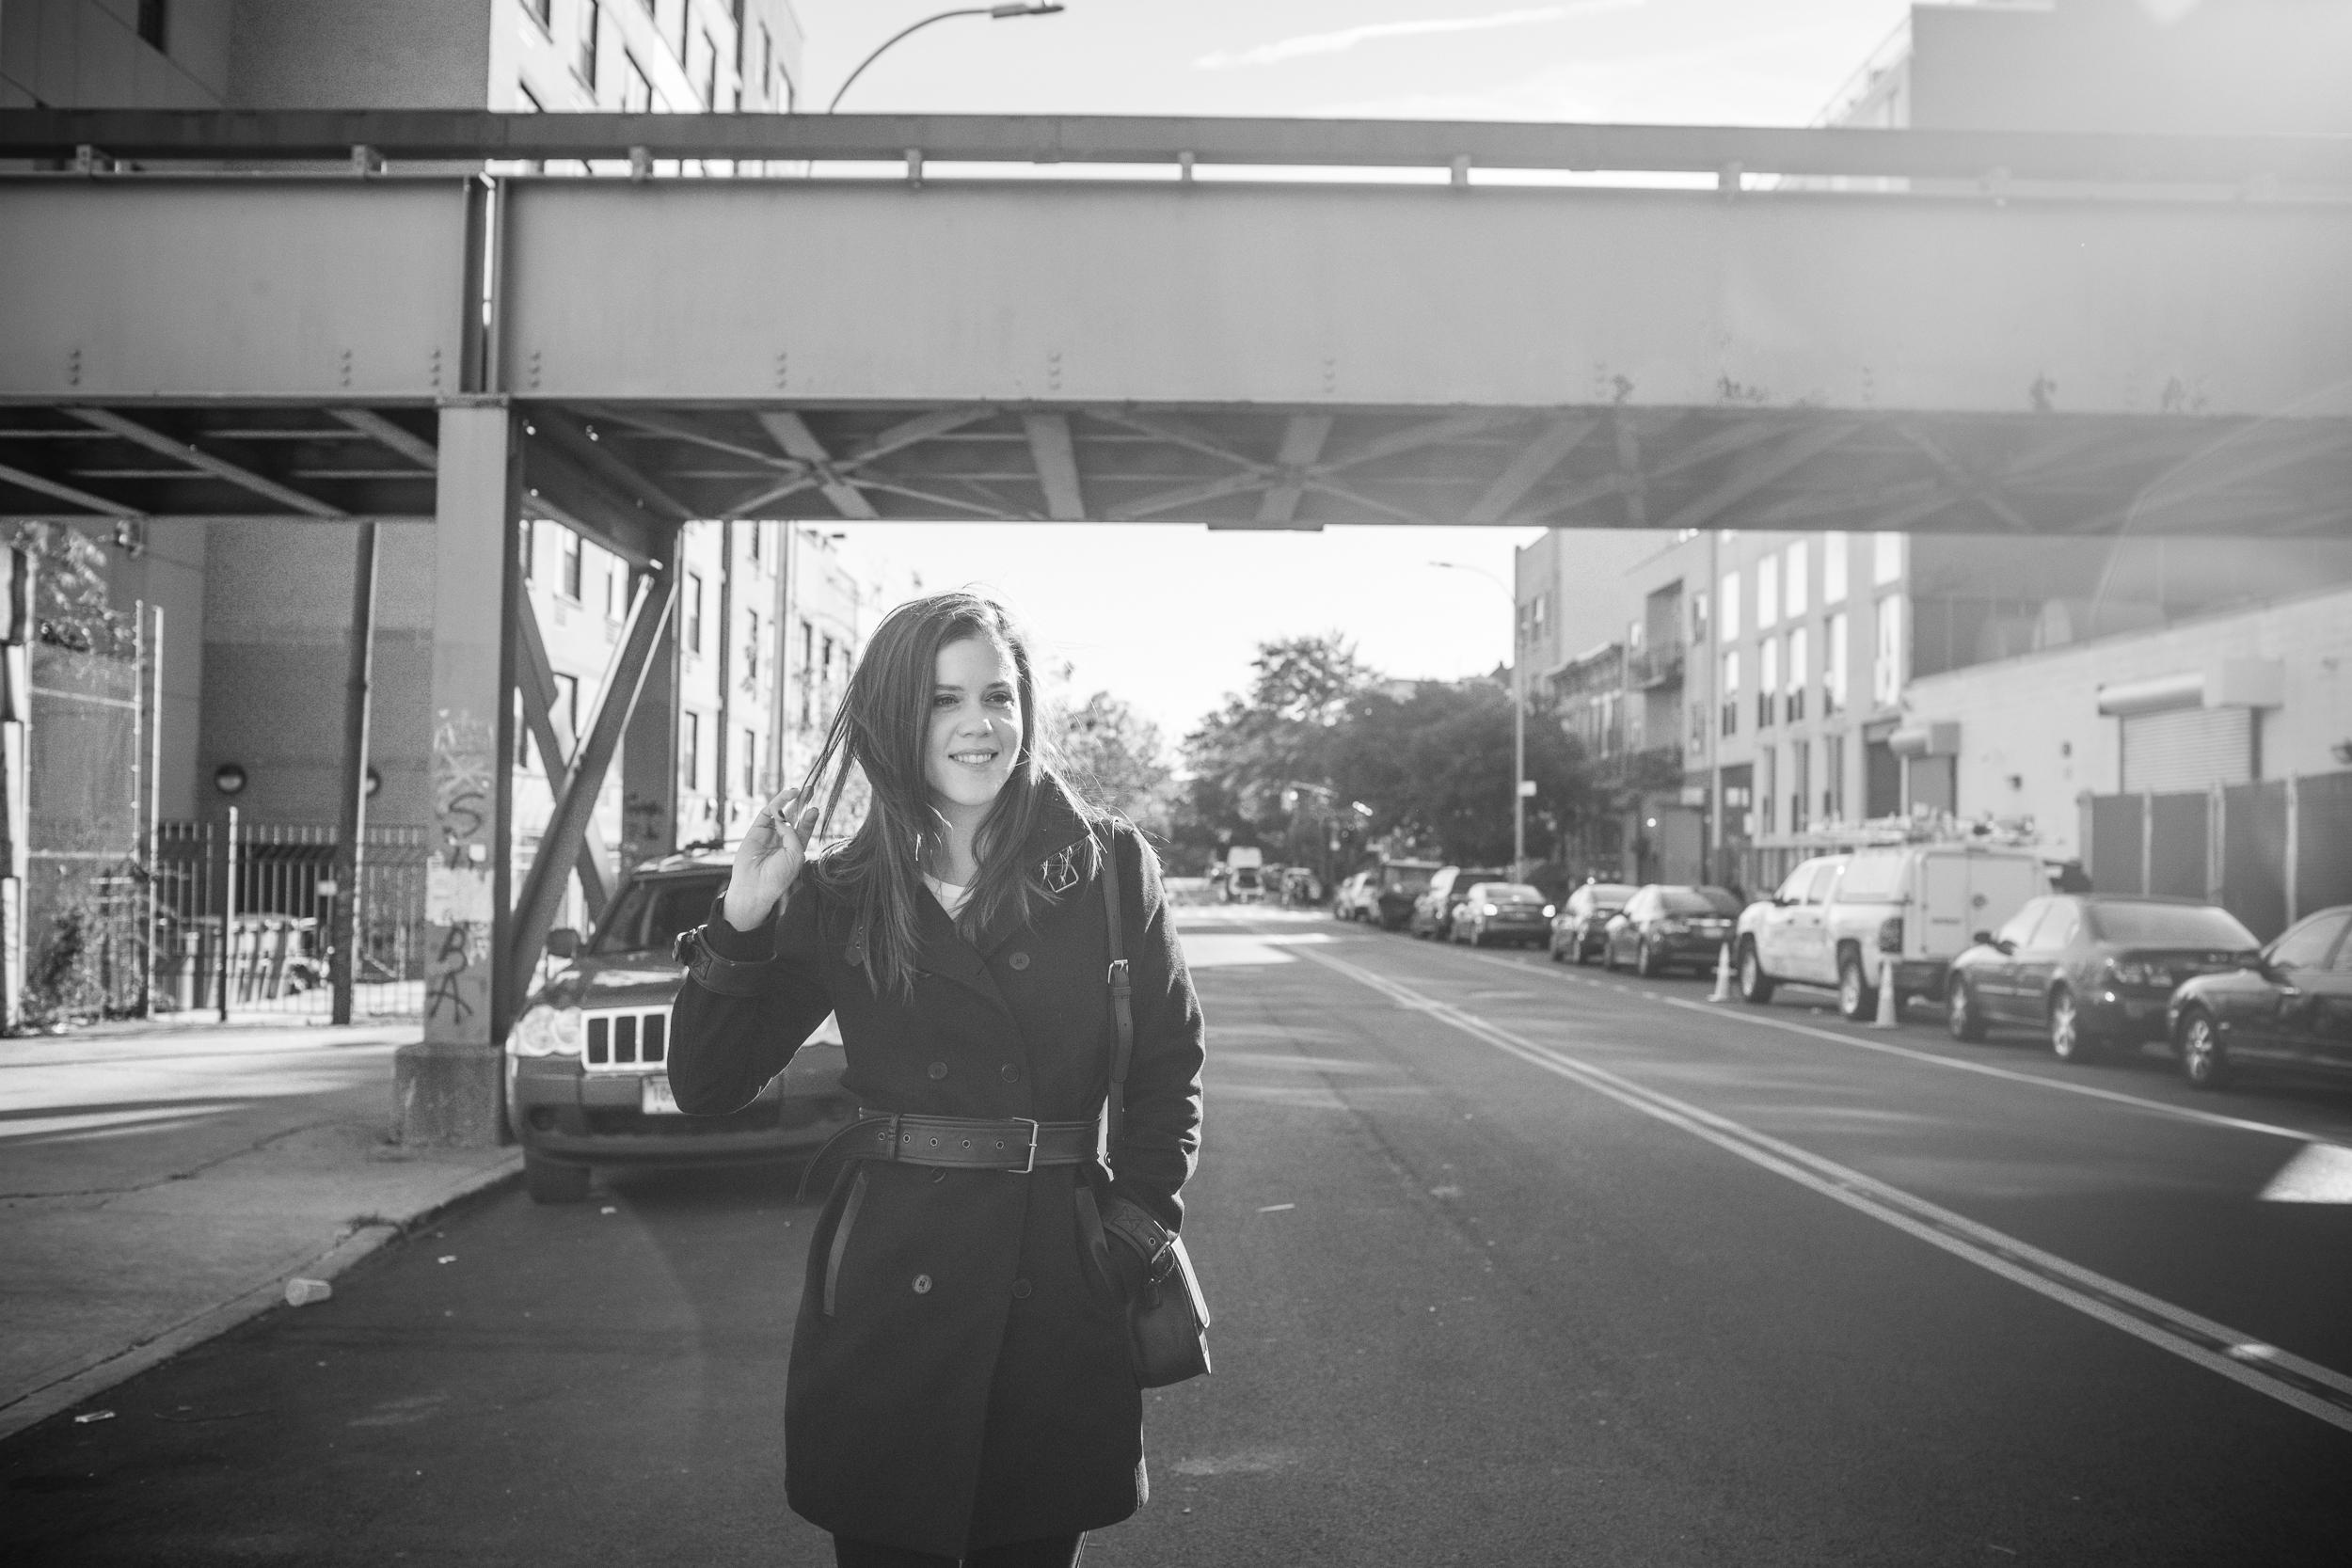 brooklyn-portrait-photographer-17.jpg